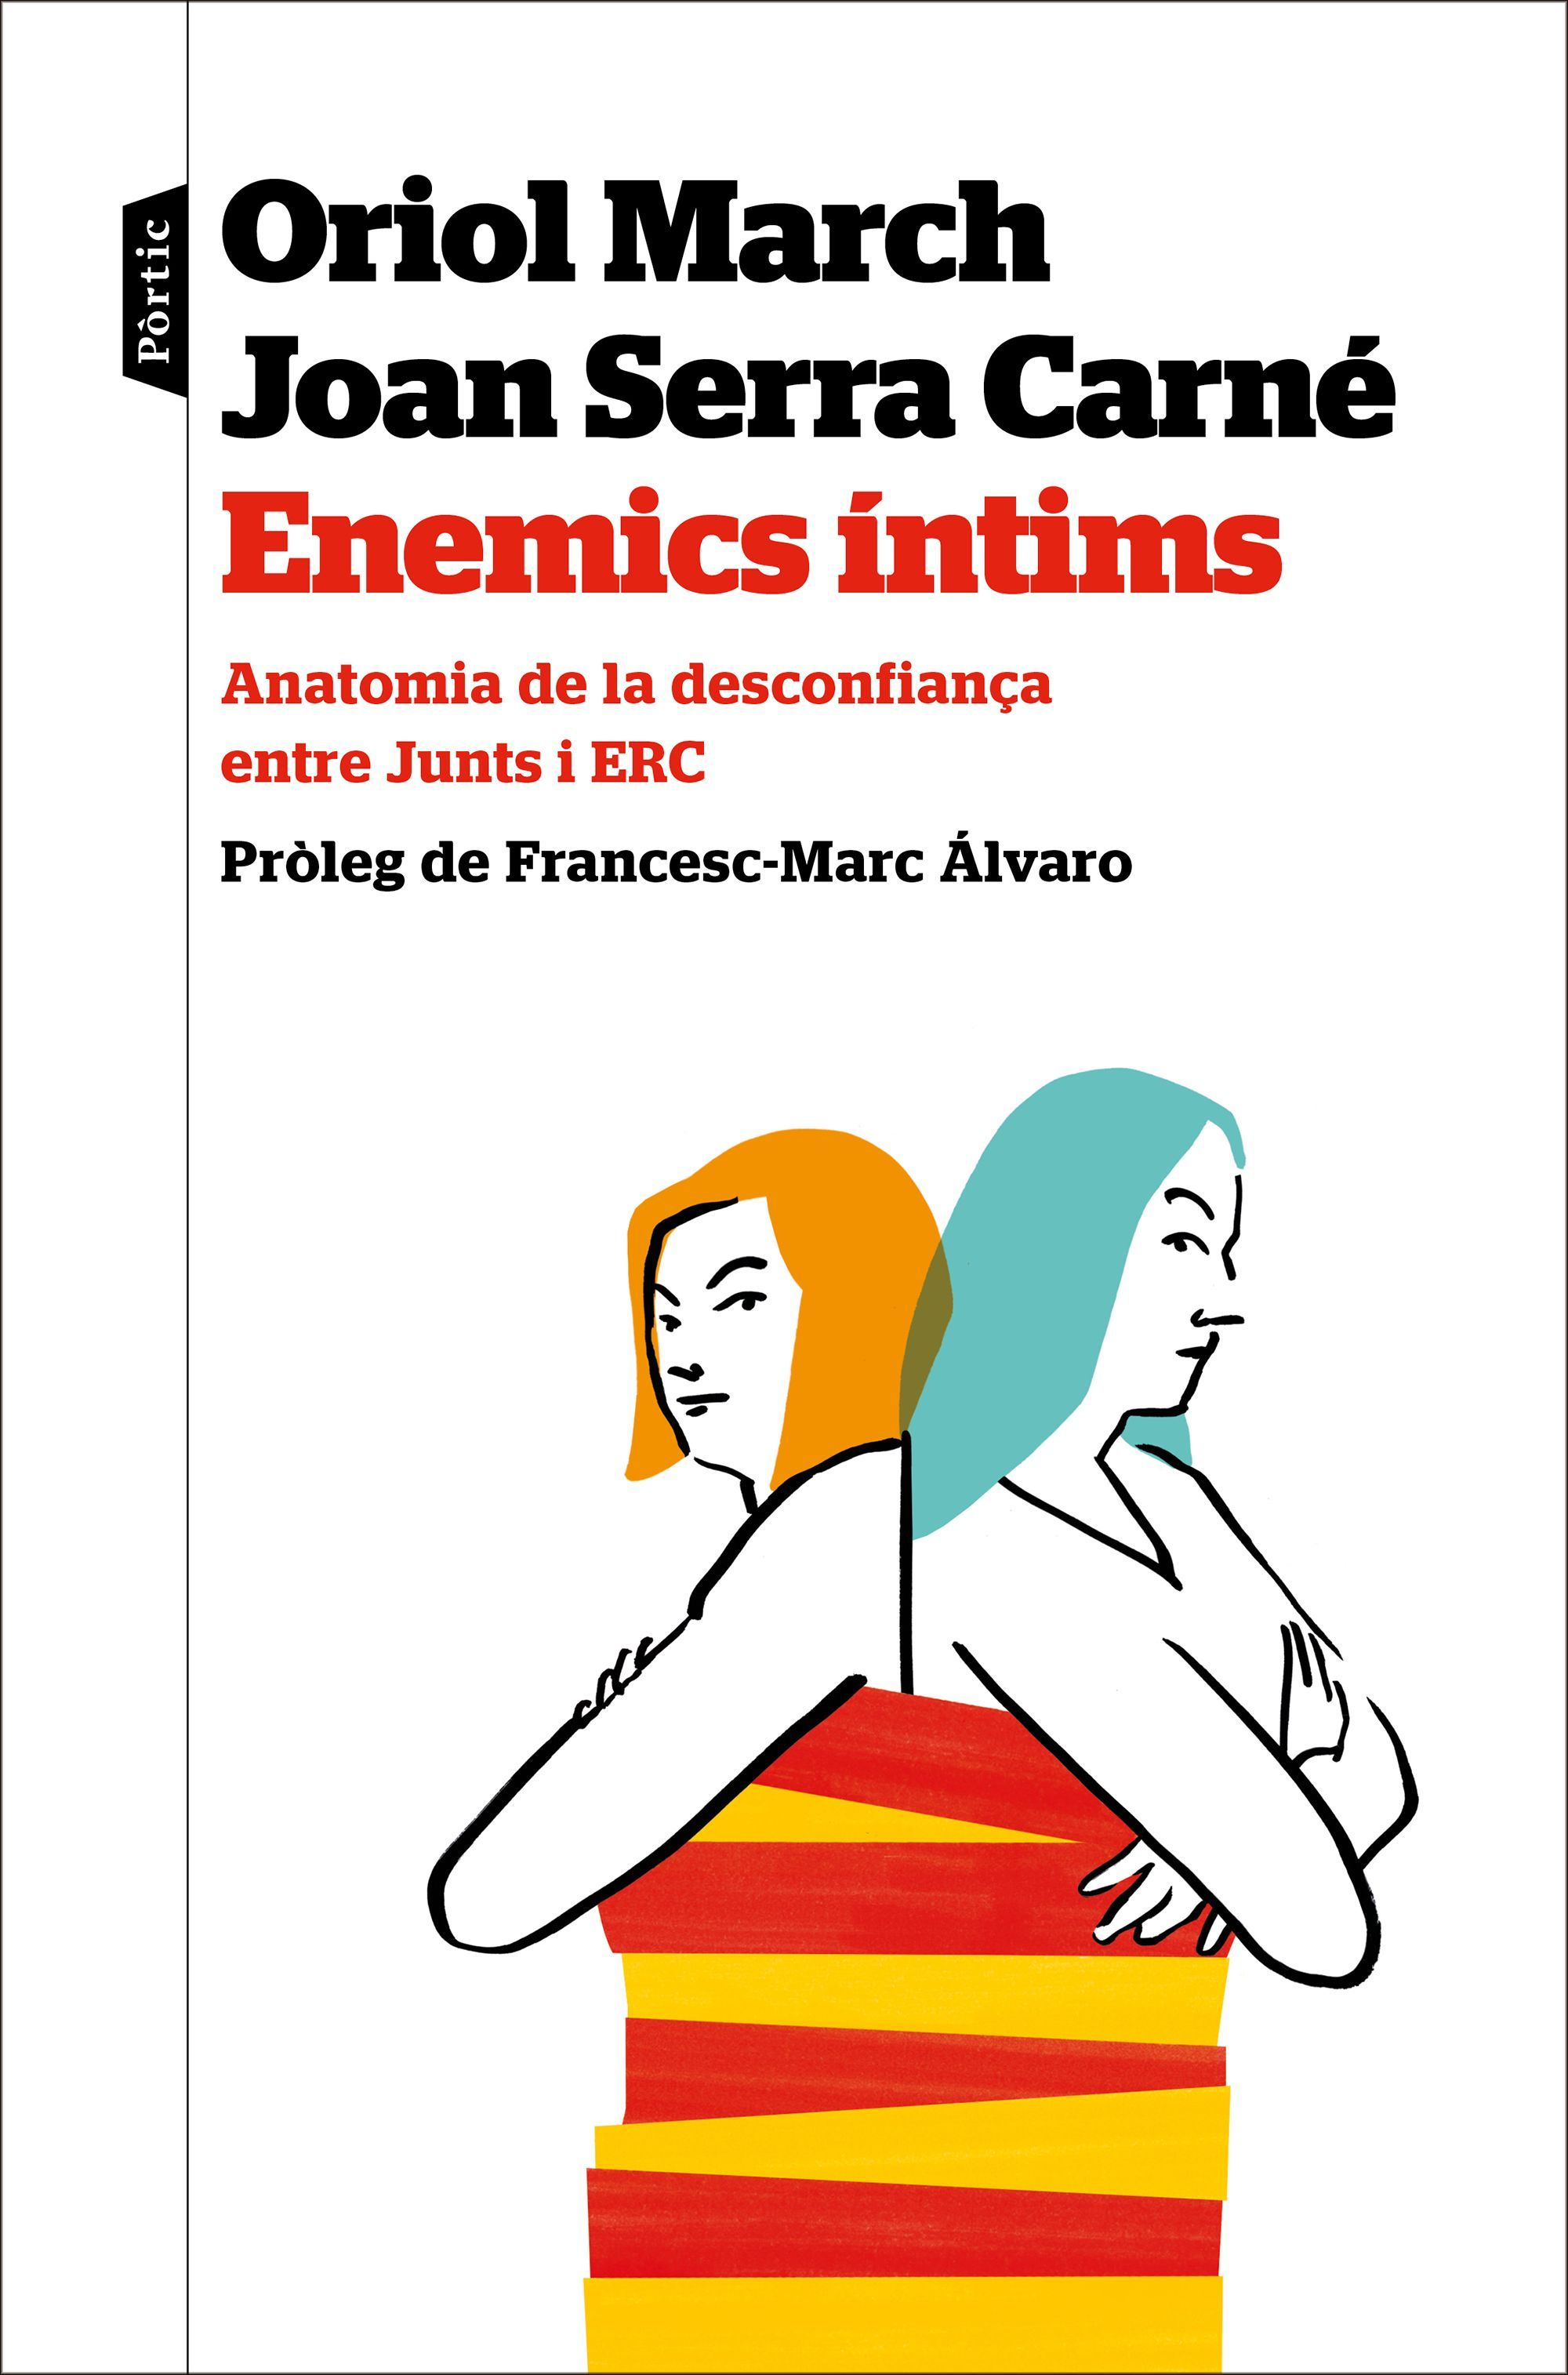 ENEMICS INTIMS